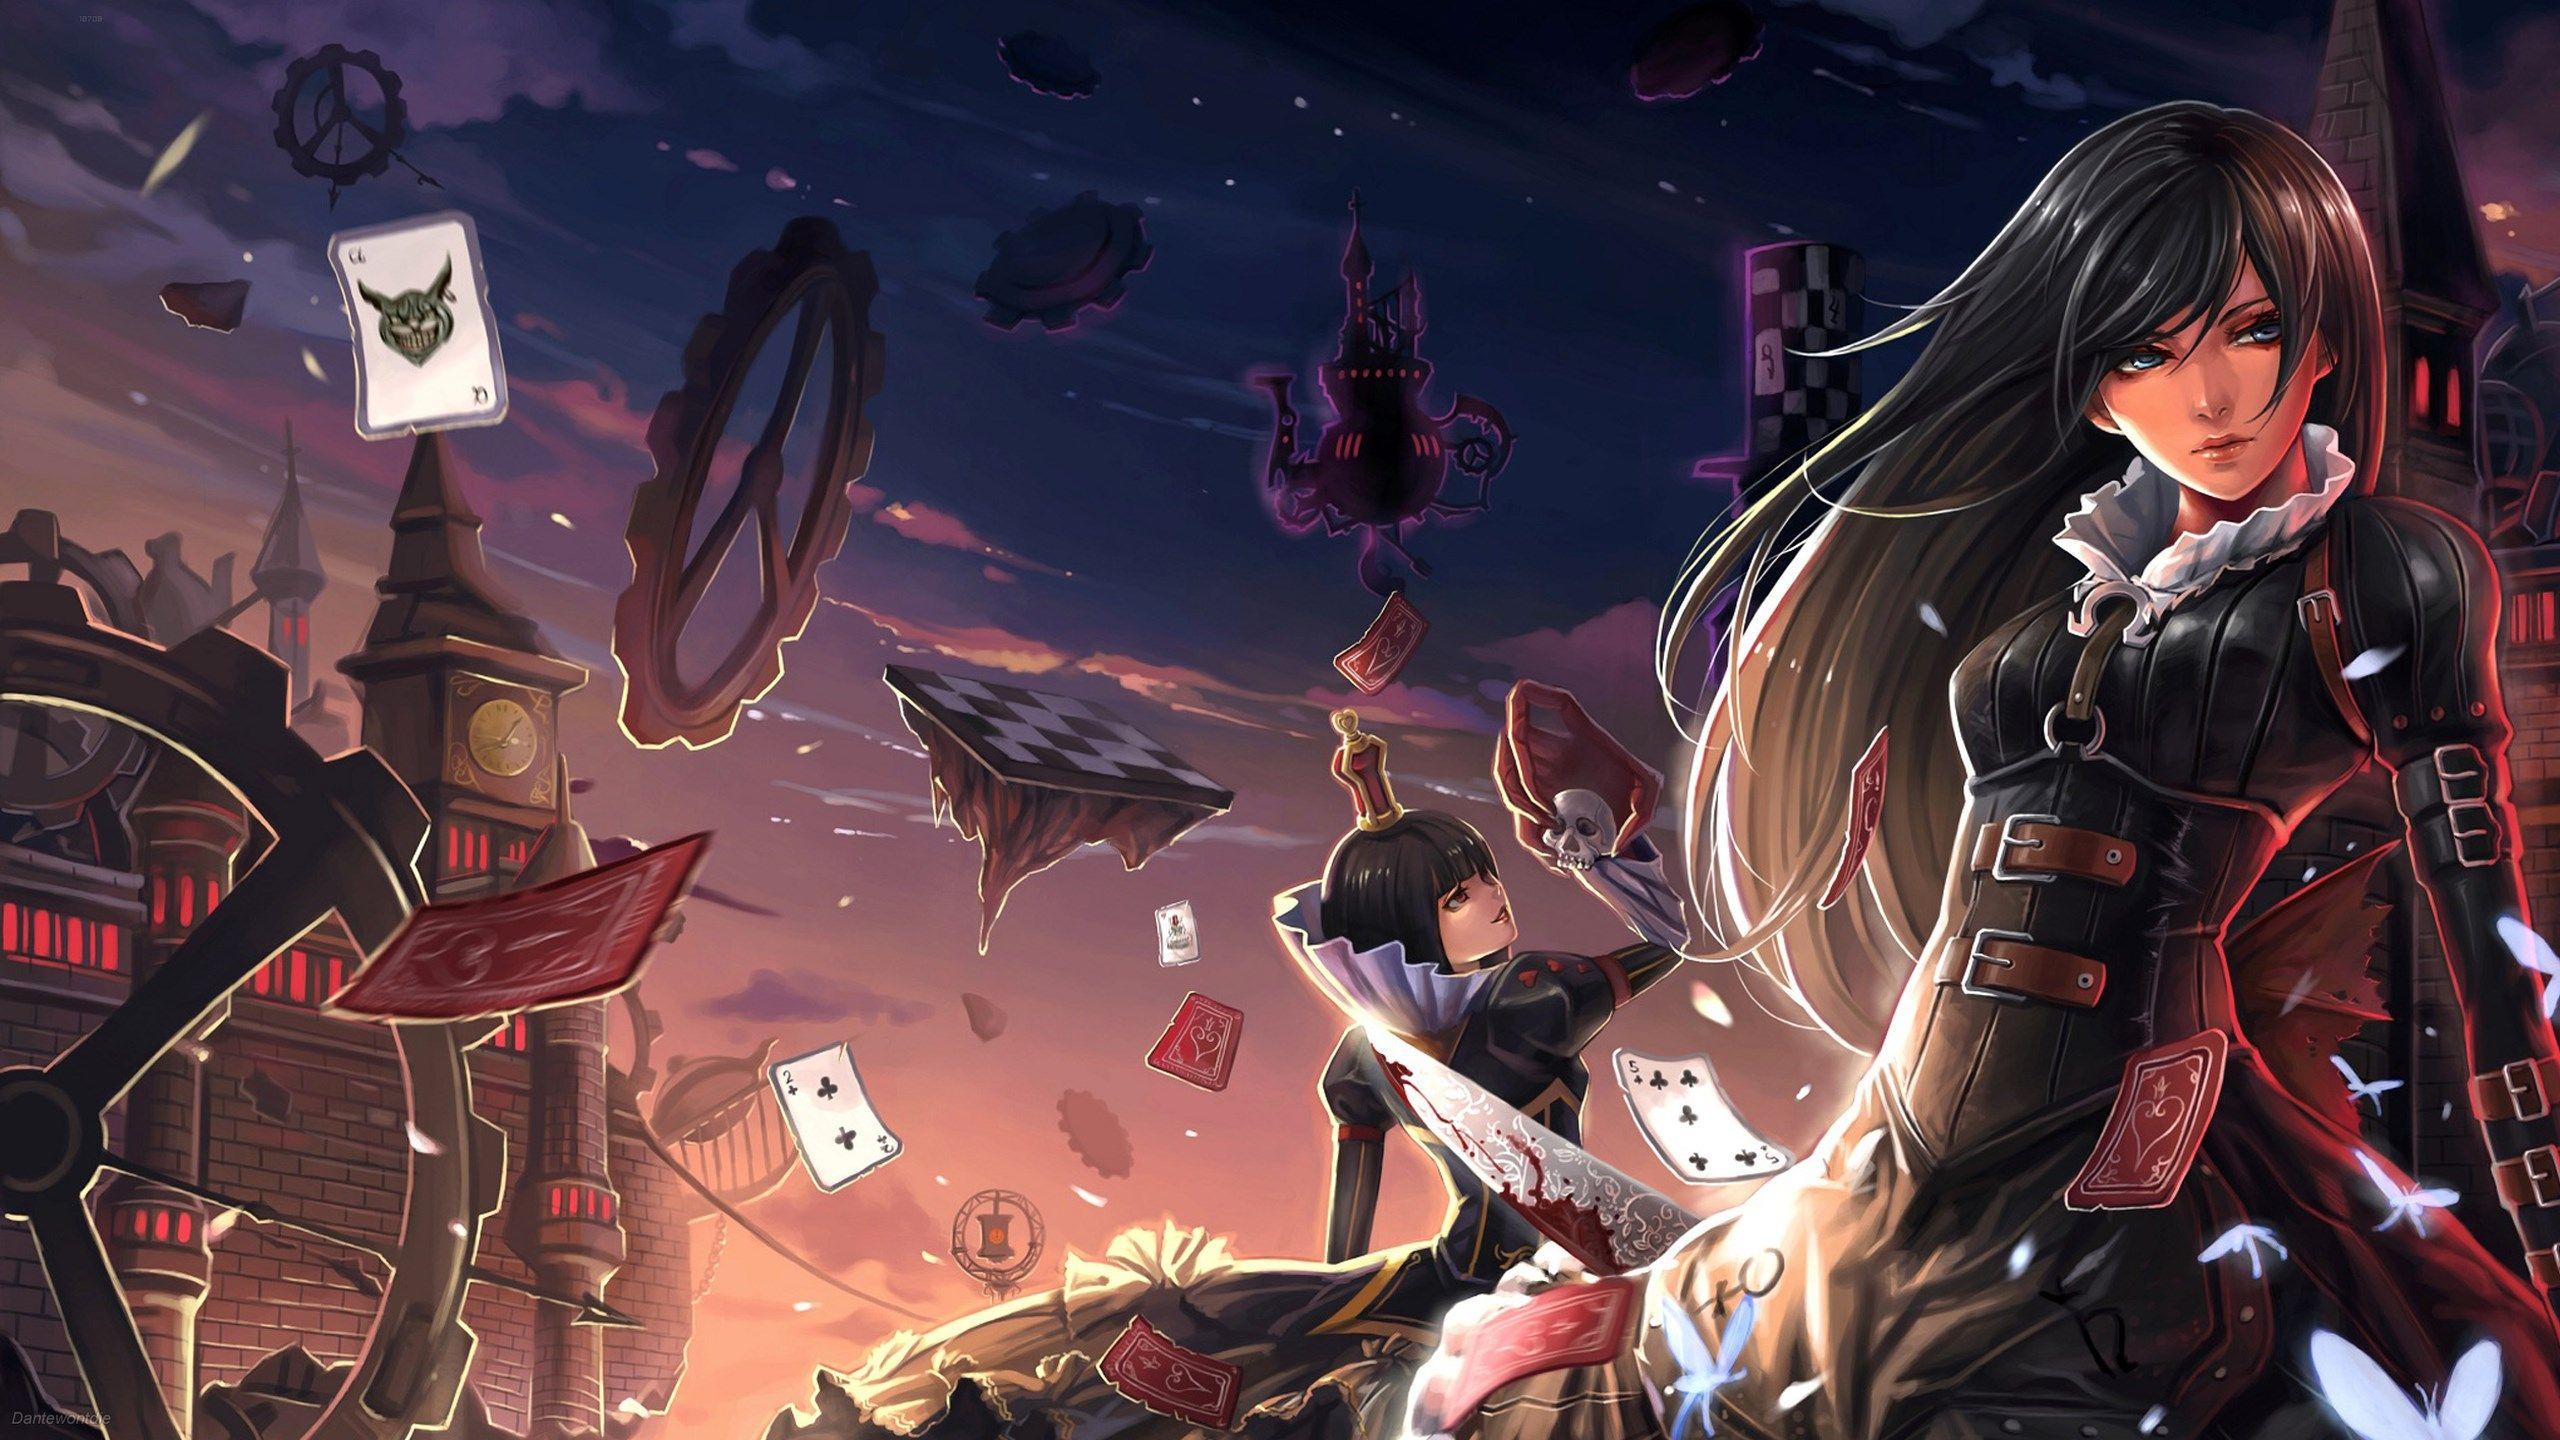 2560x1440 Wallpaper For Desktop Alice Madness Returns Dark Alice In Wonderland Alice Madness Returns Alice Madness